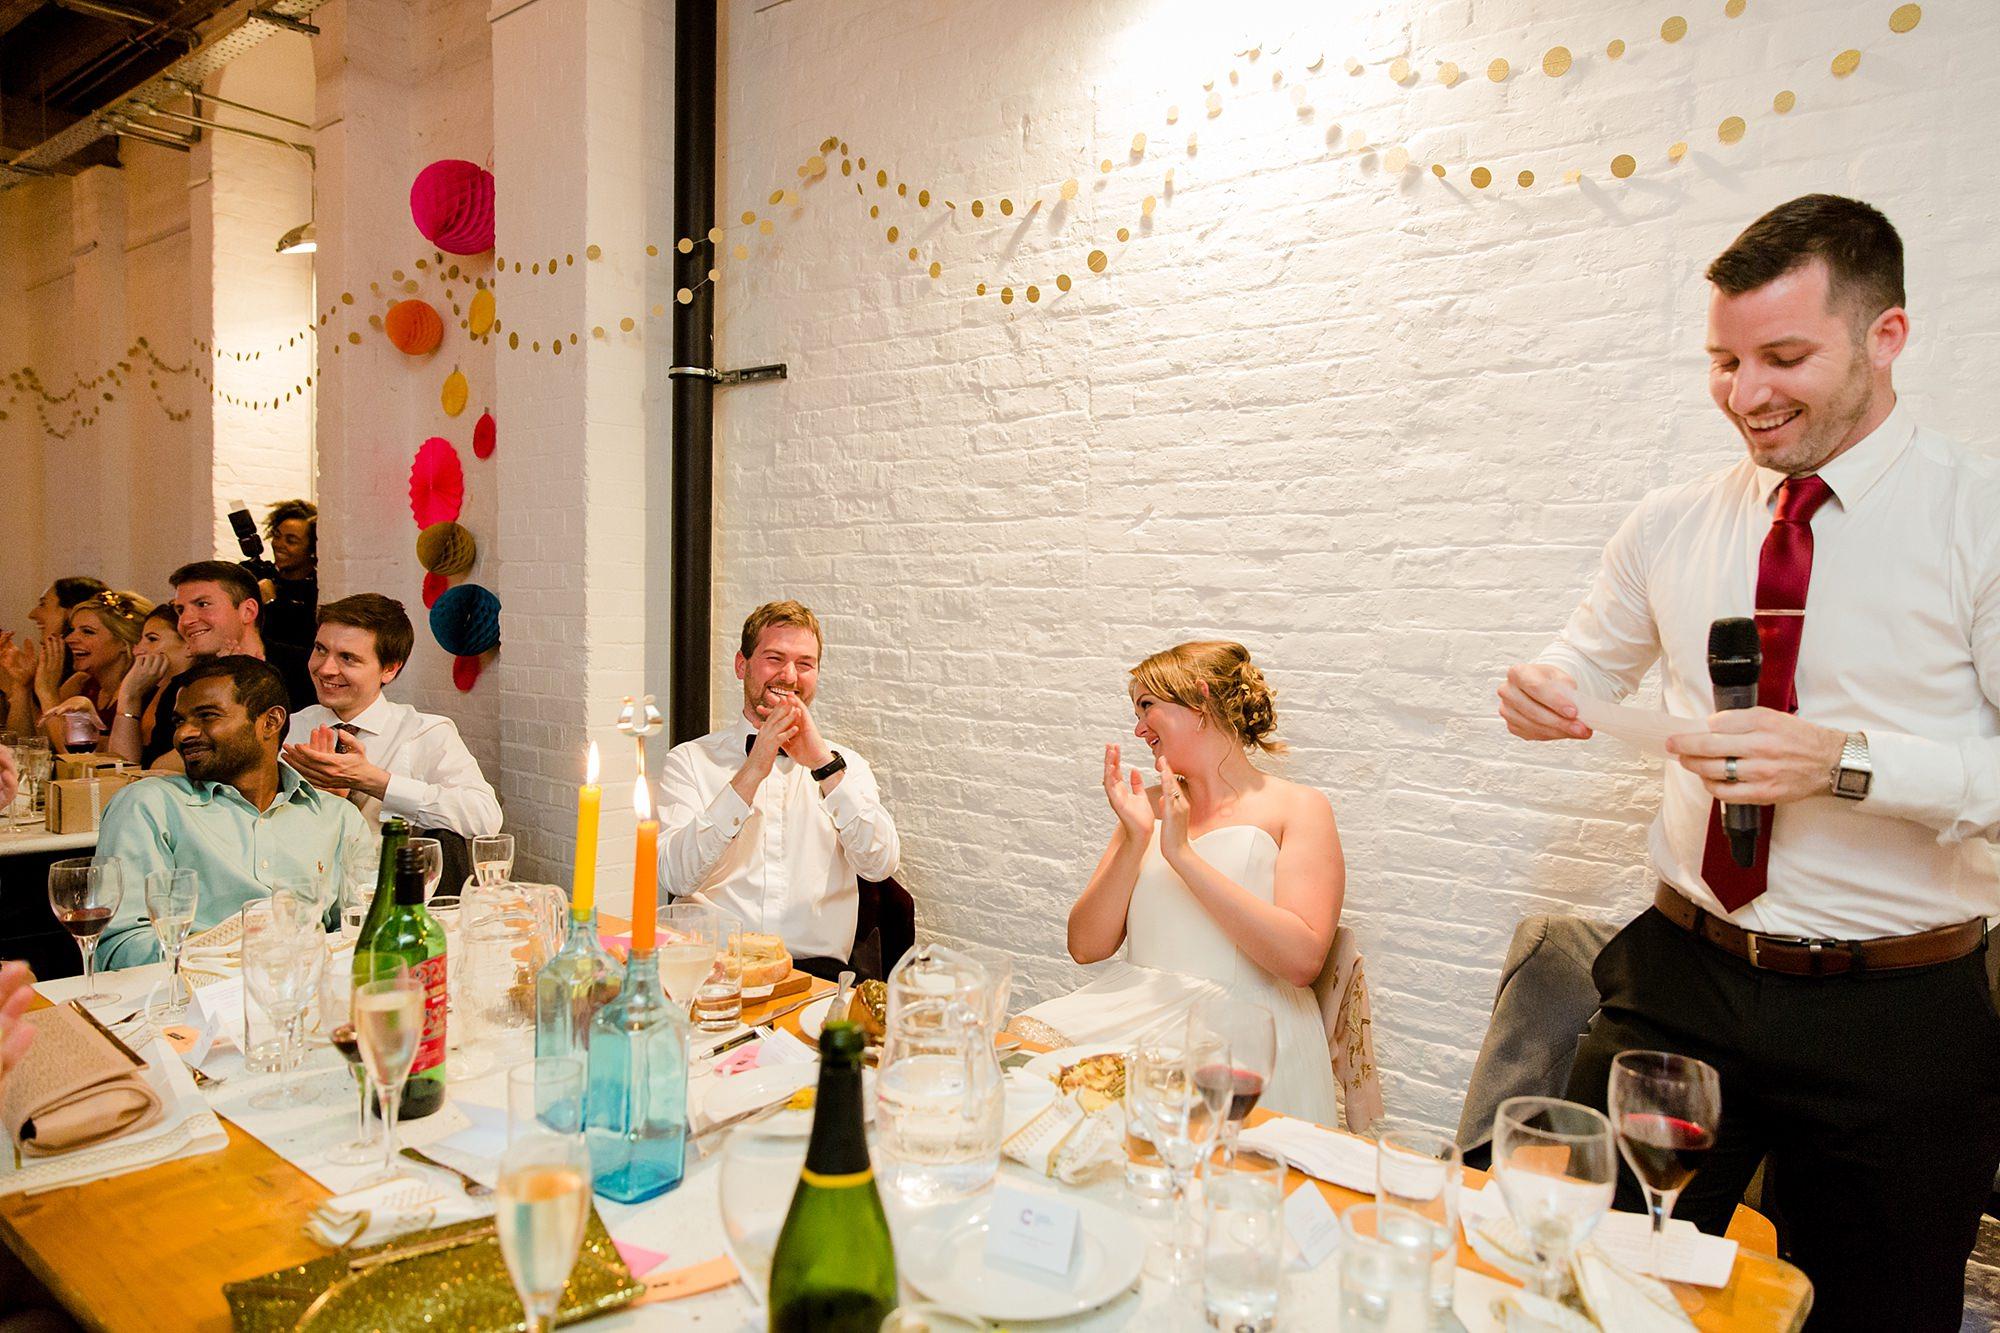 Fun London Wedding best man gives funny speech